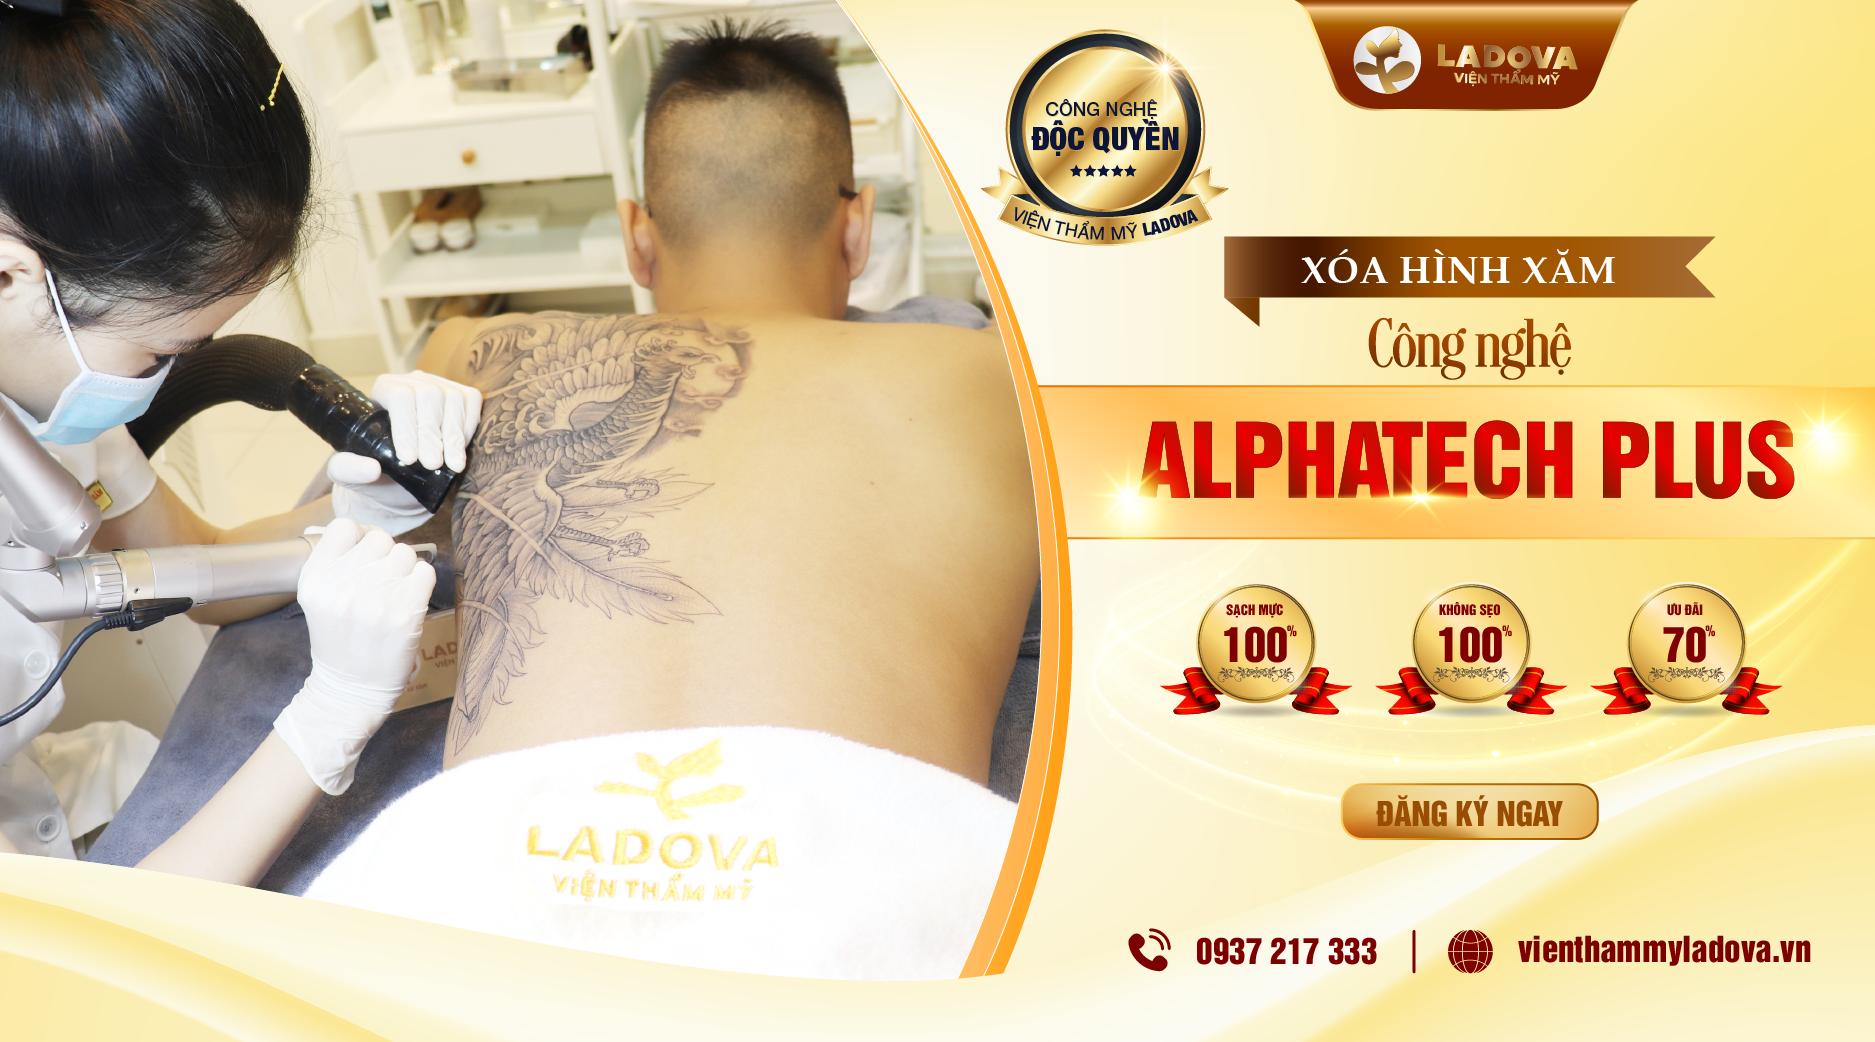 XOA-XAM-ALPHATECH-PLUS-1-01